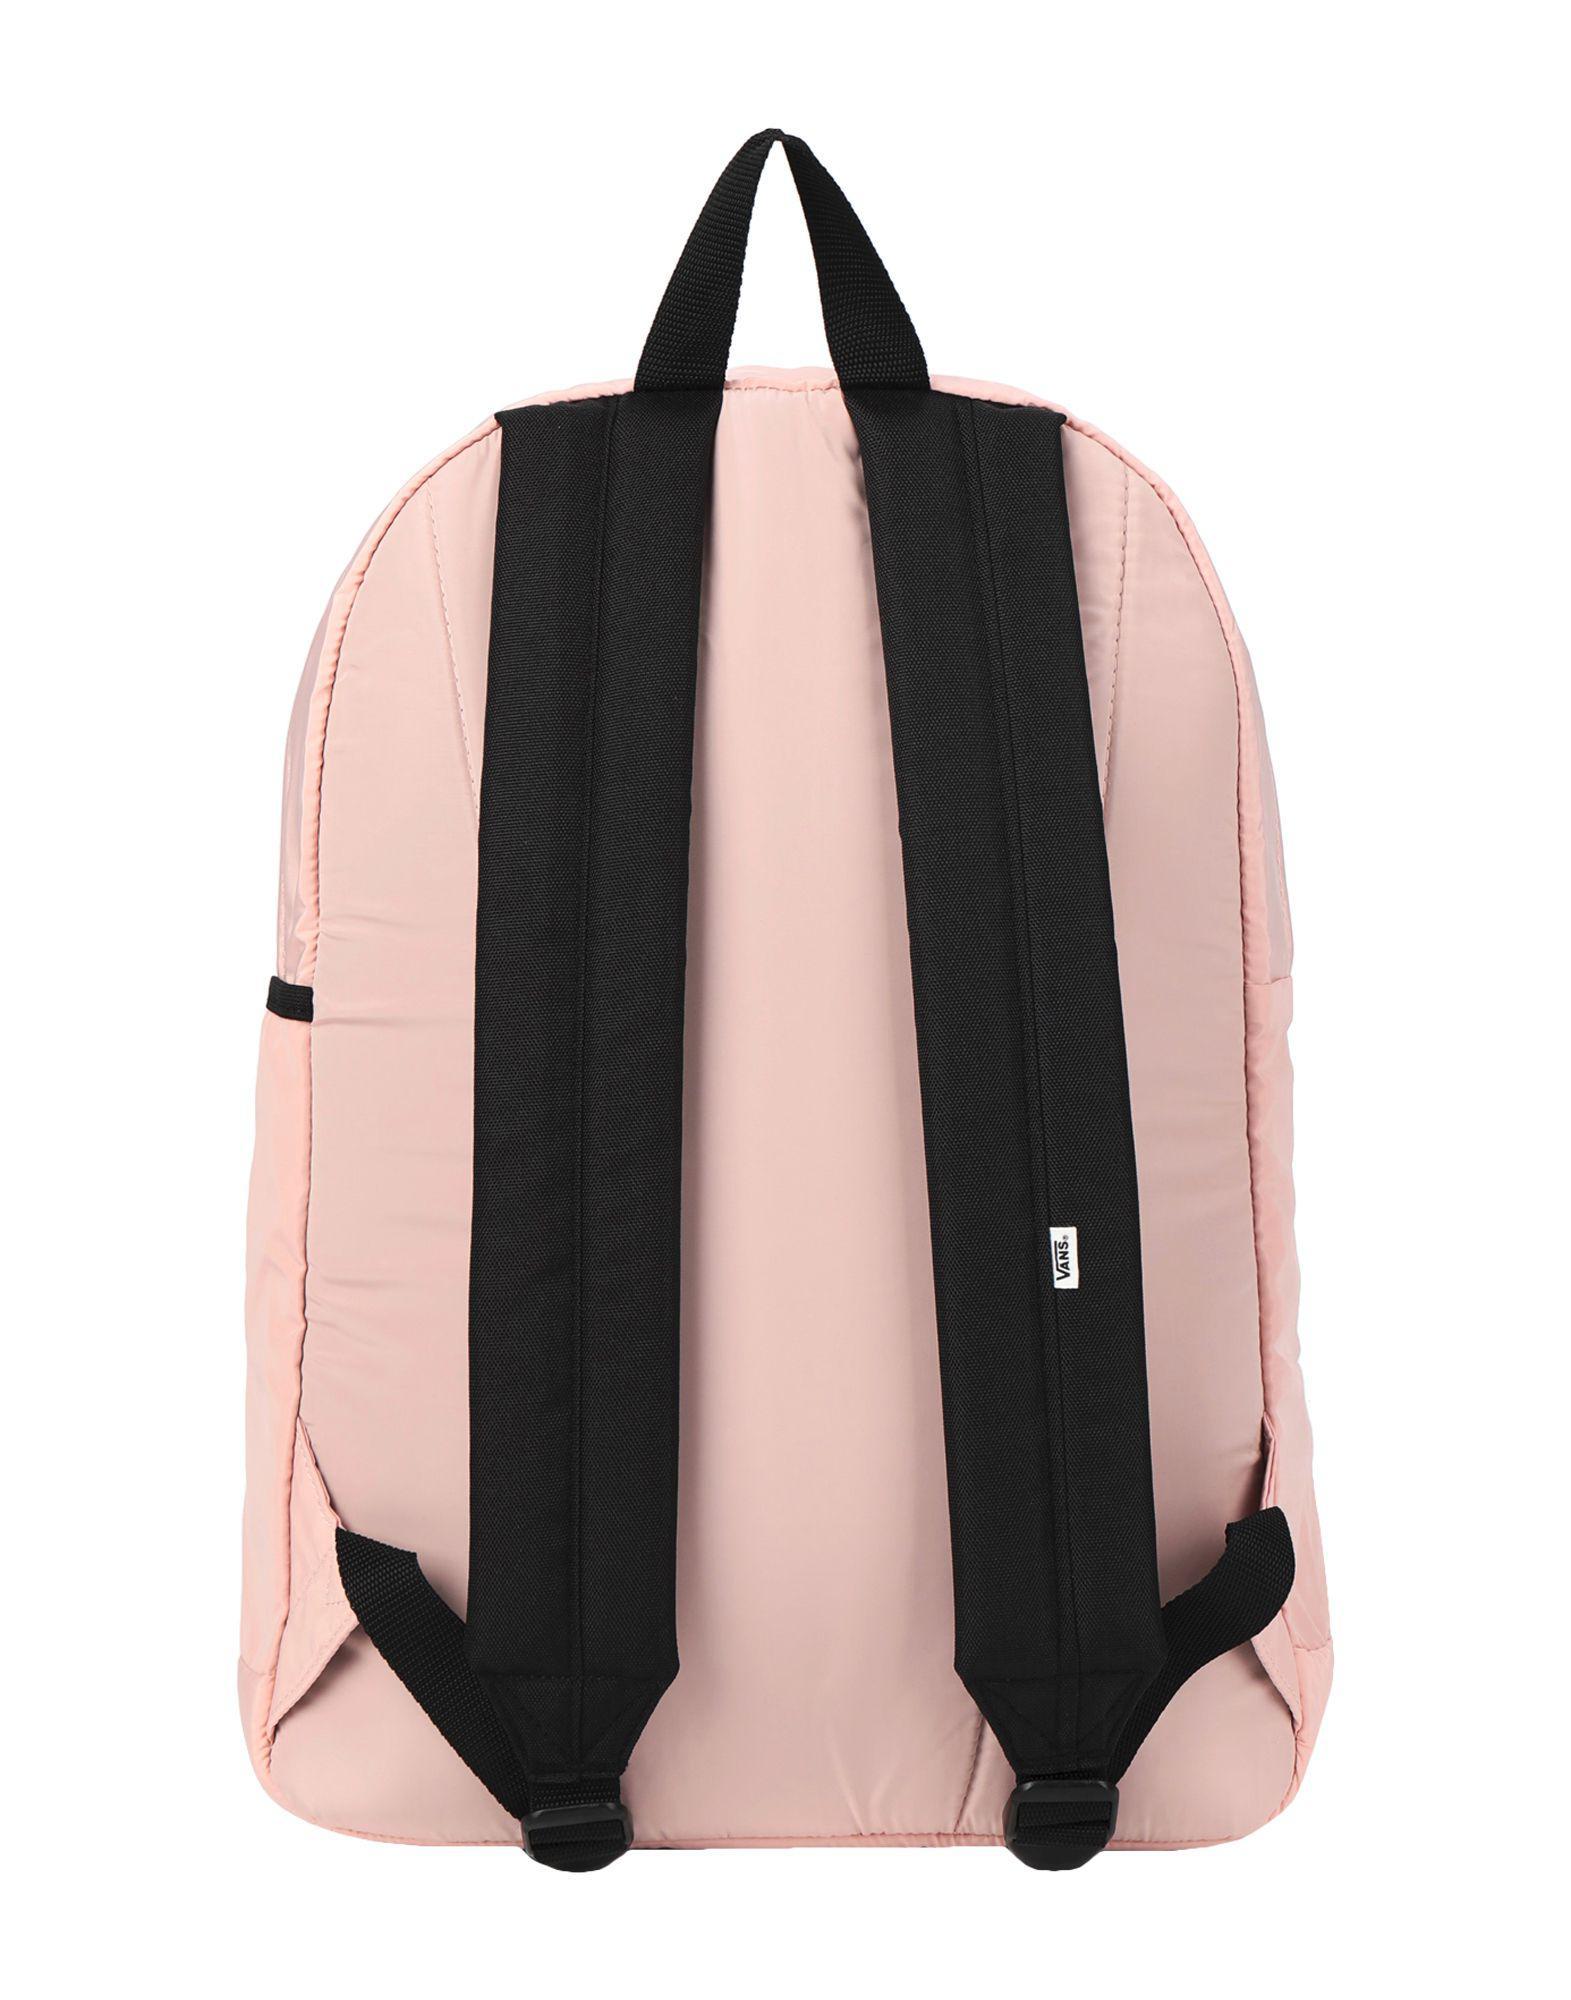 3984673f6a7 Lyst - Vans Backpacks   Bum Bags in Pink